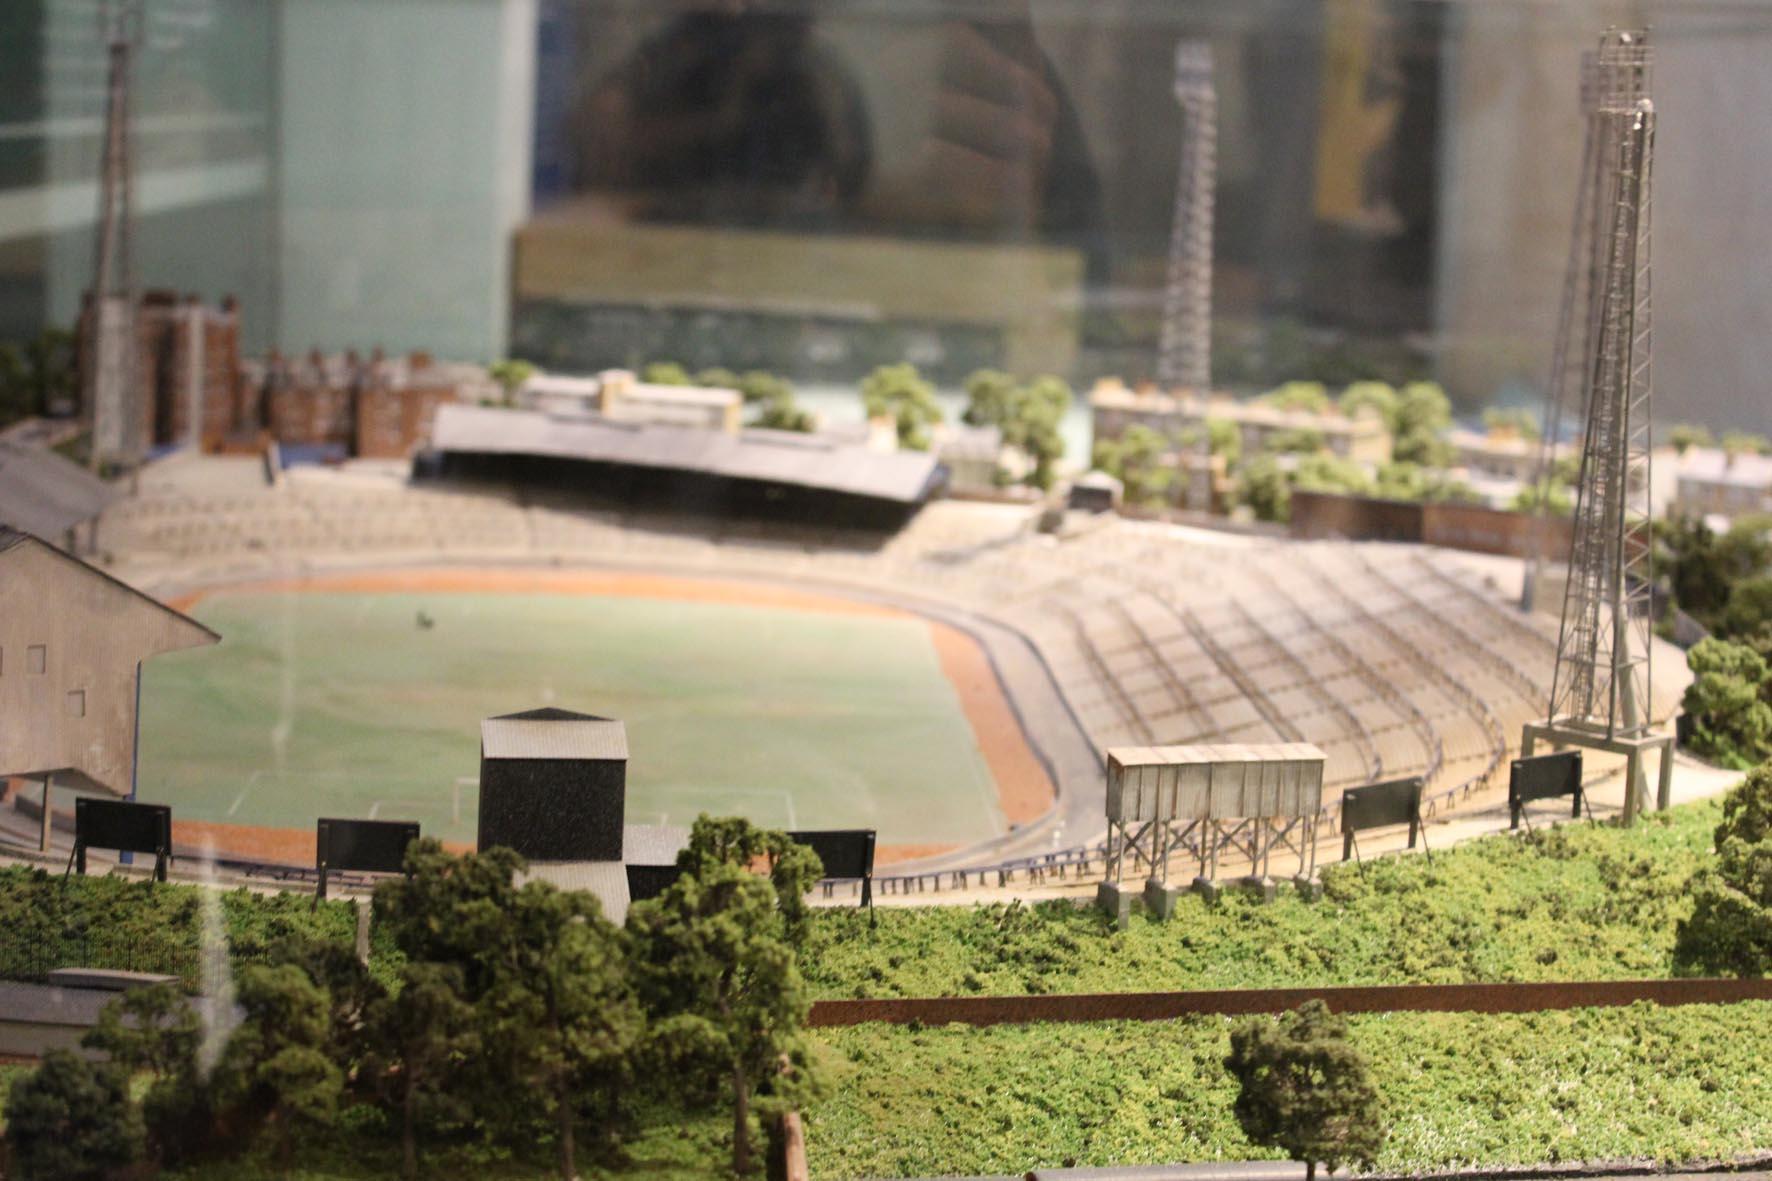 stadiontour stamford bridge, stadiontour, stamford bridge, chelsea, fc chelsea, stadion, tour, altes stadion